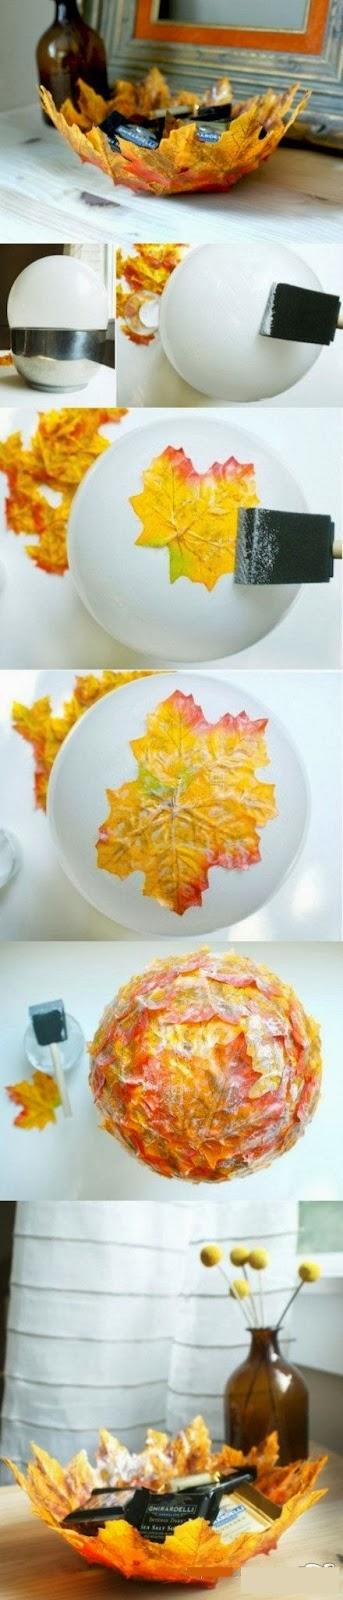 Home+Craft+Leaf+Bowl+autumn.jpg 343×1,600 pixels